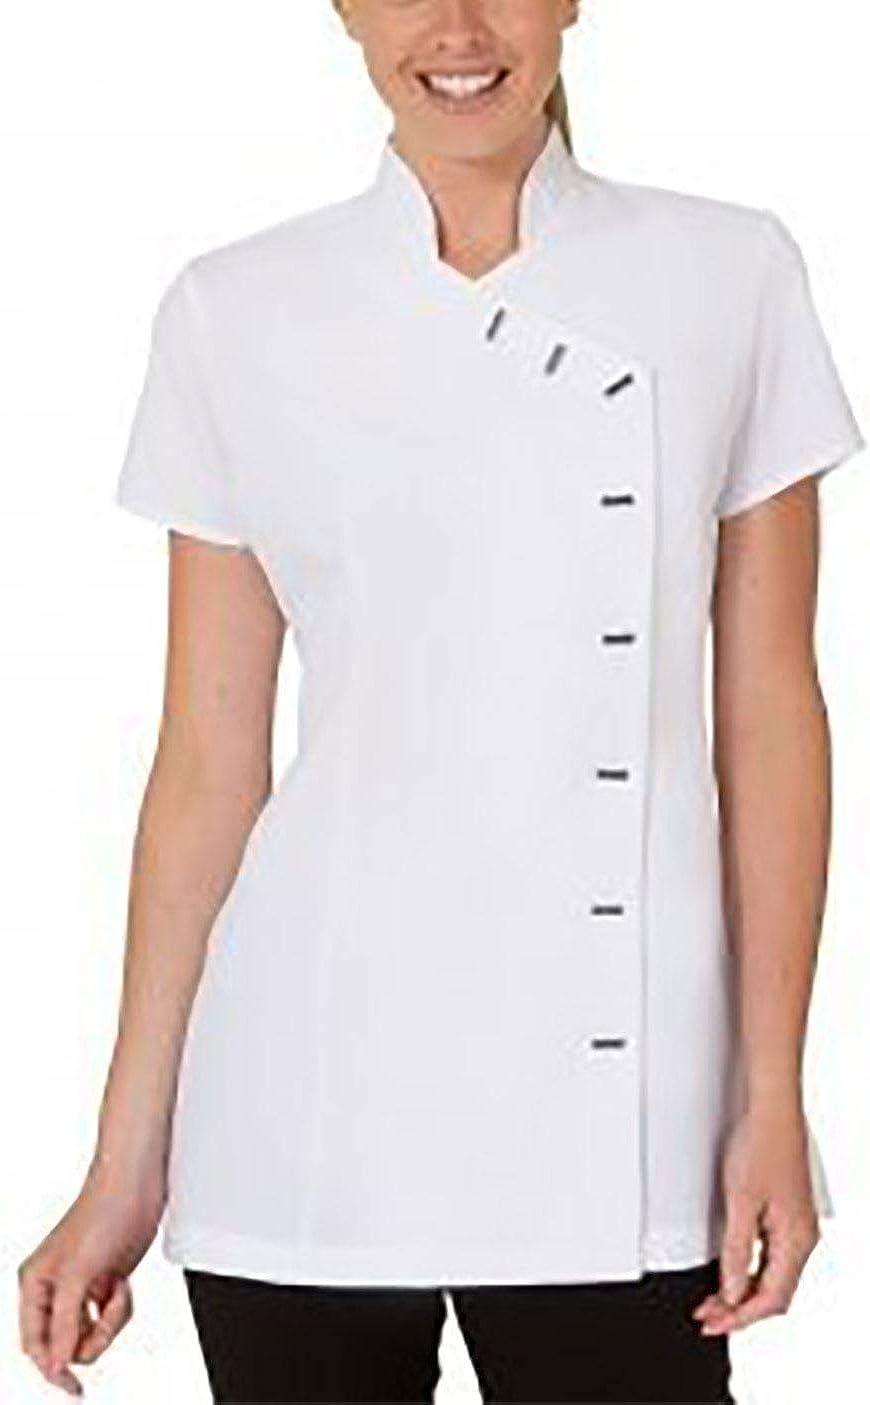 Work Wear Massage Therapsit T-Shirt Industrial Office Uniform Tee Top